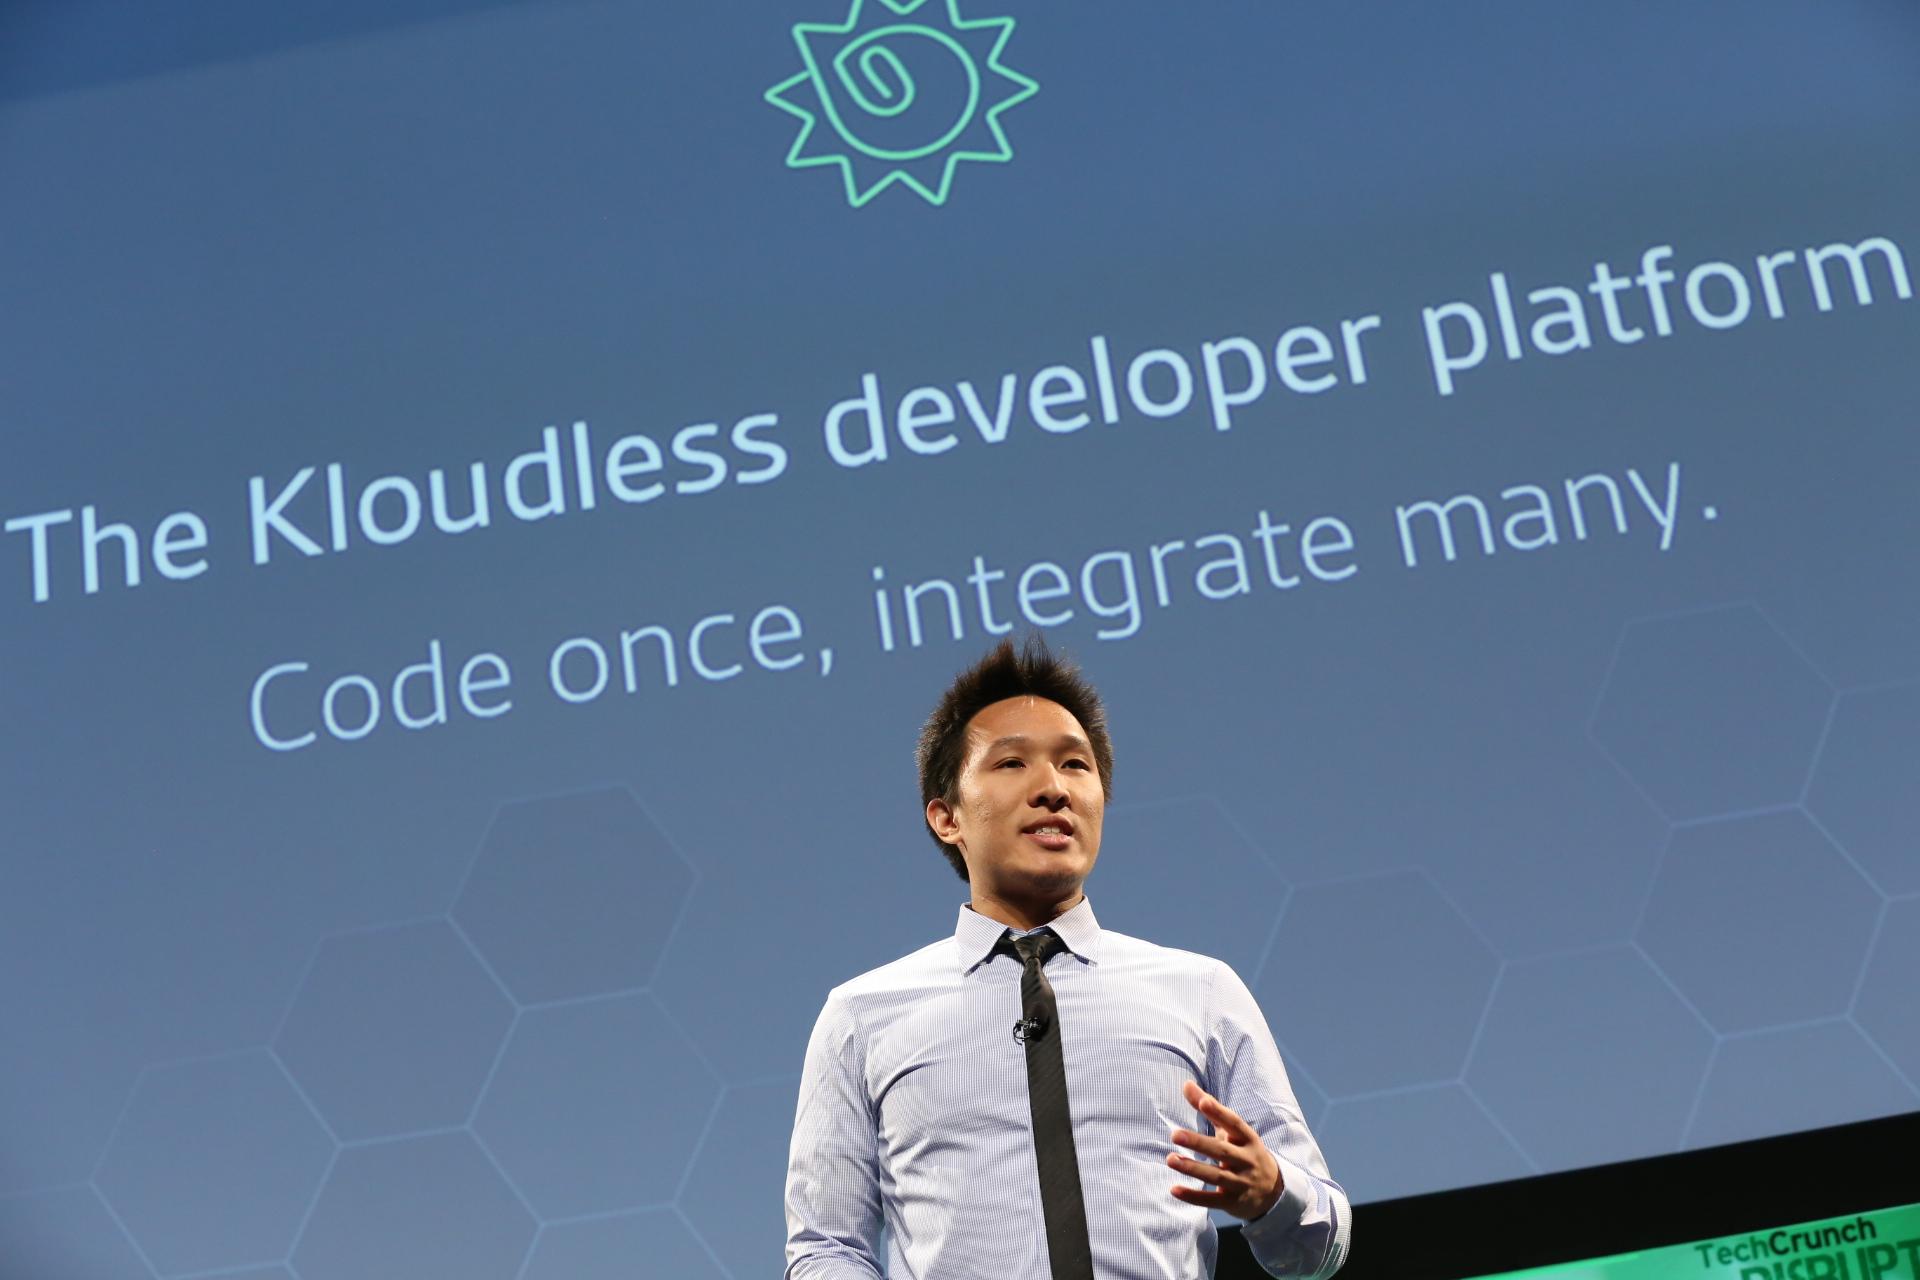 kloudless-developer-platform